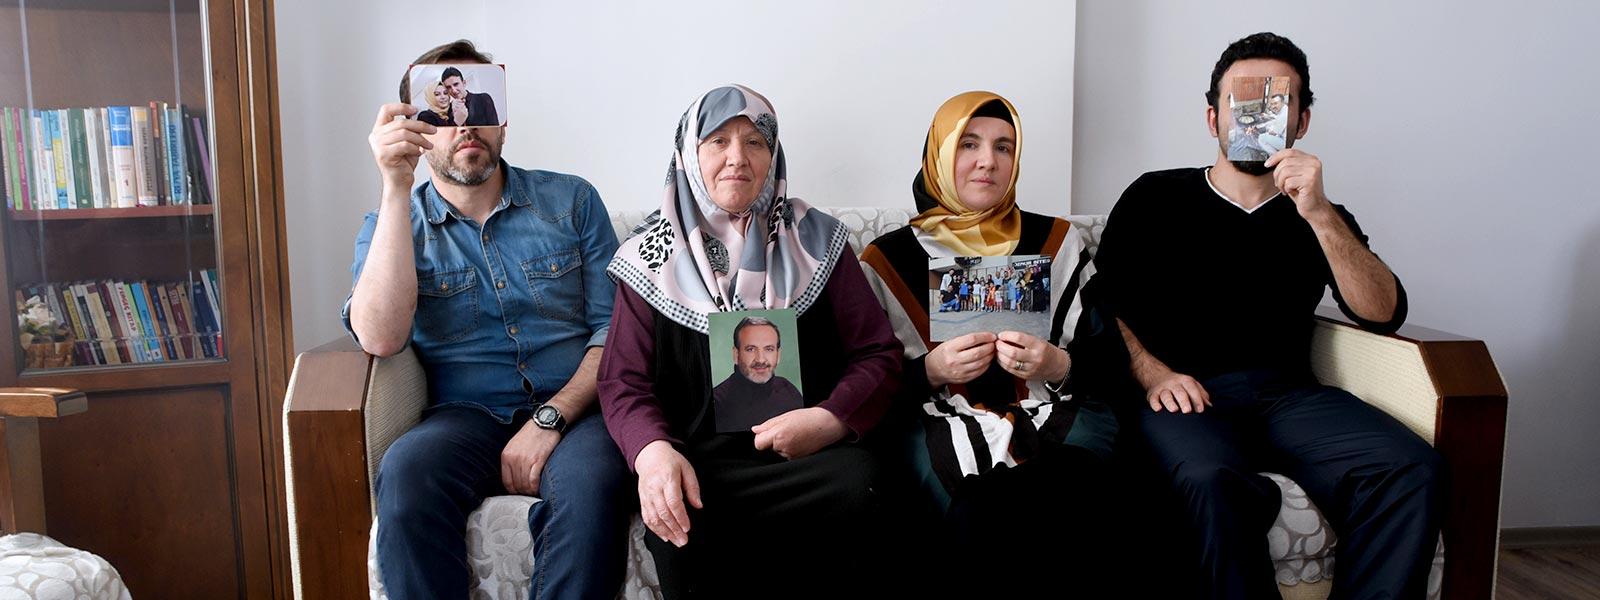 Turkey: the great purge, Episode 1: Asli - FRANCE 24